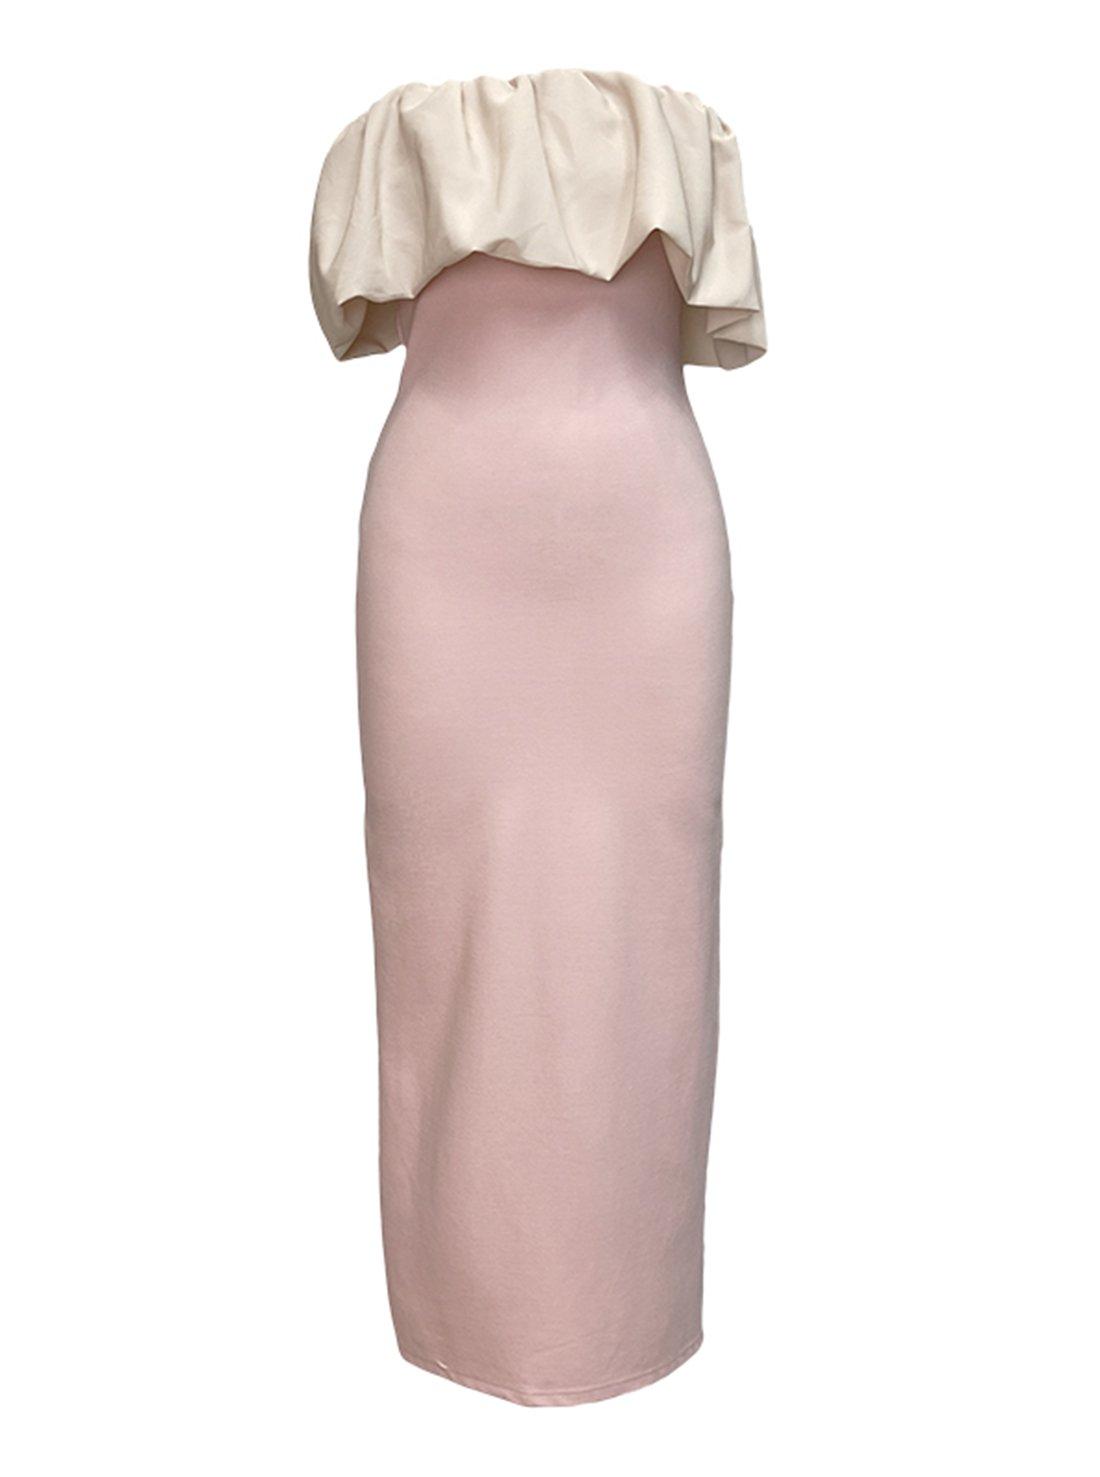 Ruffle Tube Off Shoulder Bodycon Dress